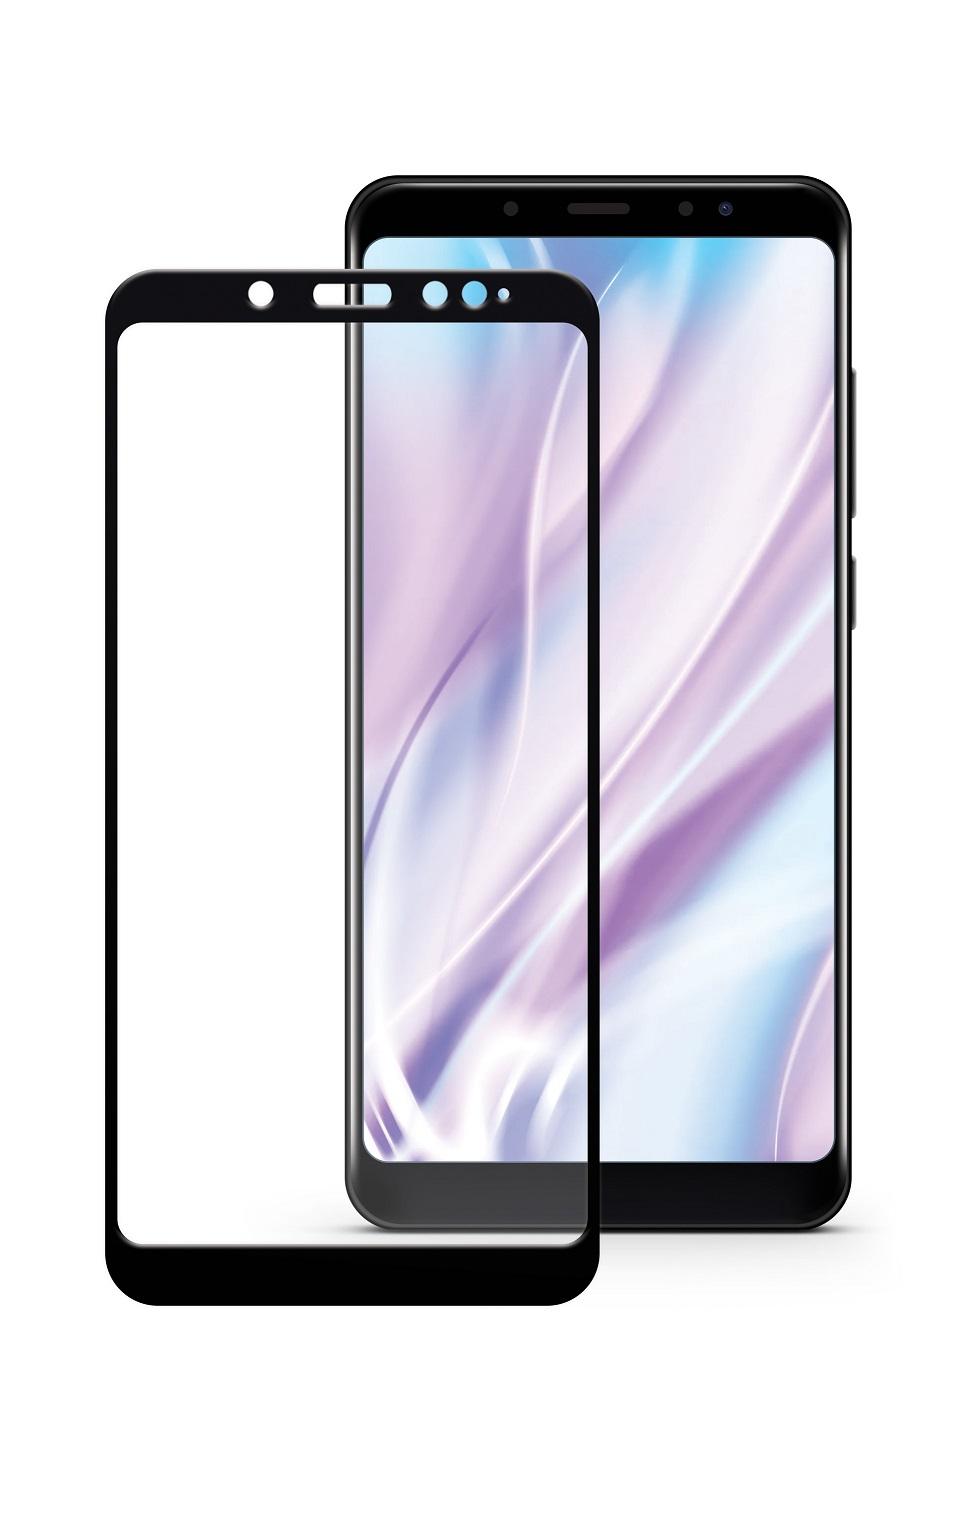 Защитное стекло Mobius для Xiaomi Redmi Note 5/5 Pro 3D Full cover (Black) защитное стекло mobius для xiaomi mi note 3 3d full cover black